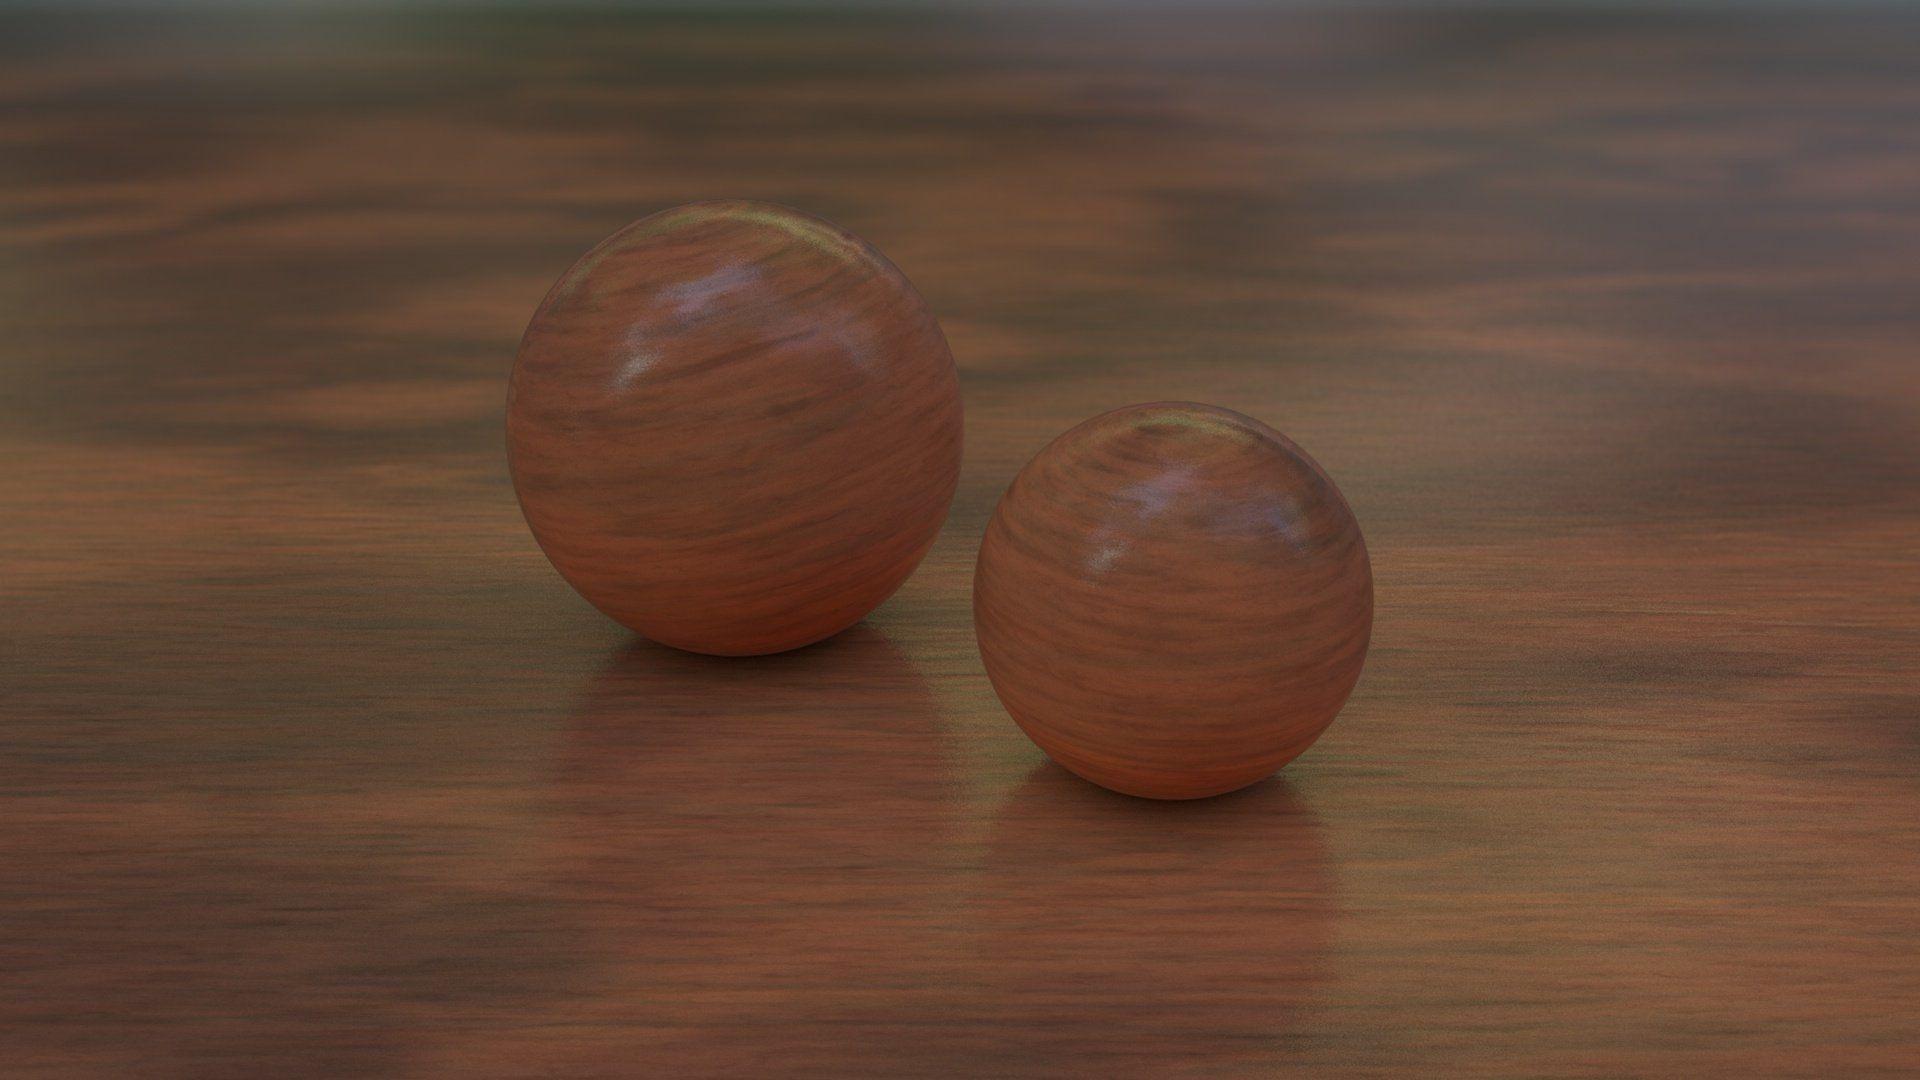 23 Seamless Tileable Wood Textures Seamless#Textures#Tileable #AD #woodtextureseamless 23 Seamless Tileable Wood Textures Seamless#Textures#Tileable #AD #woodtextureseamless 23 Seamless Tileable Wood Textures Seamless#Textures#Tileable #AD #woodtextureseamless 23 Seamless Tileable Wood Textures Seamless#Textures#Tileable #AD #woodtextureseamless 23 Seamless Tileable Wood Textures Seamless#Textures#Tileable #AD #woodtextureseamless 23 Seamless Tileable Wood Textures Seamless#Textures#Tileable #AD #woodtextureseamless